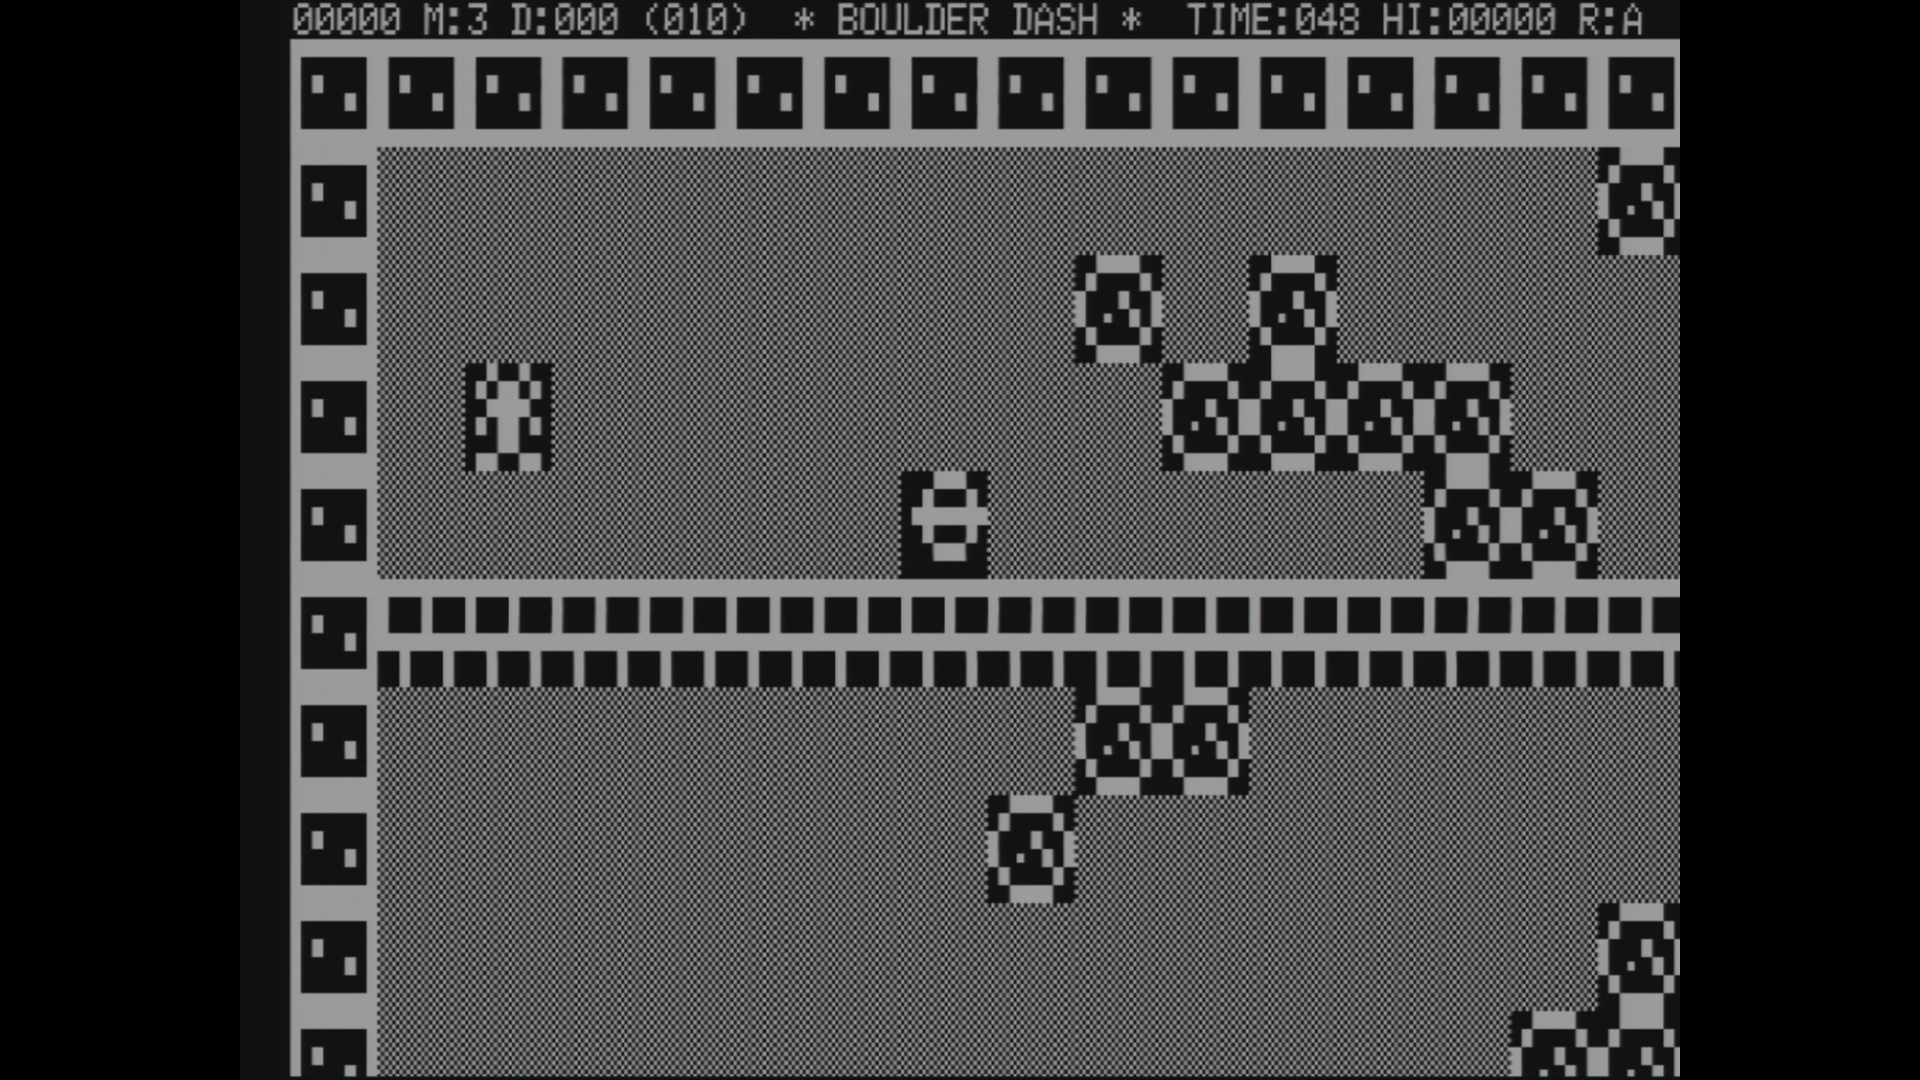 MiST VGA upscaling experiments - Page 6 - Atari-Forum